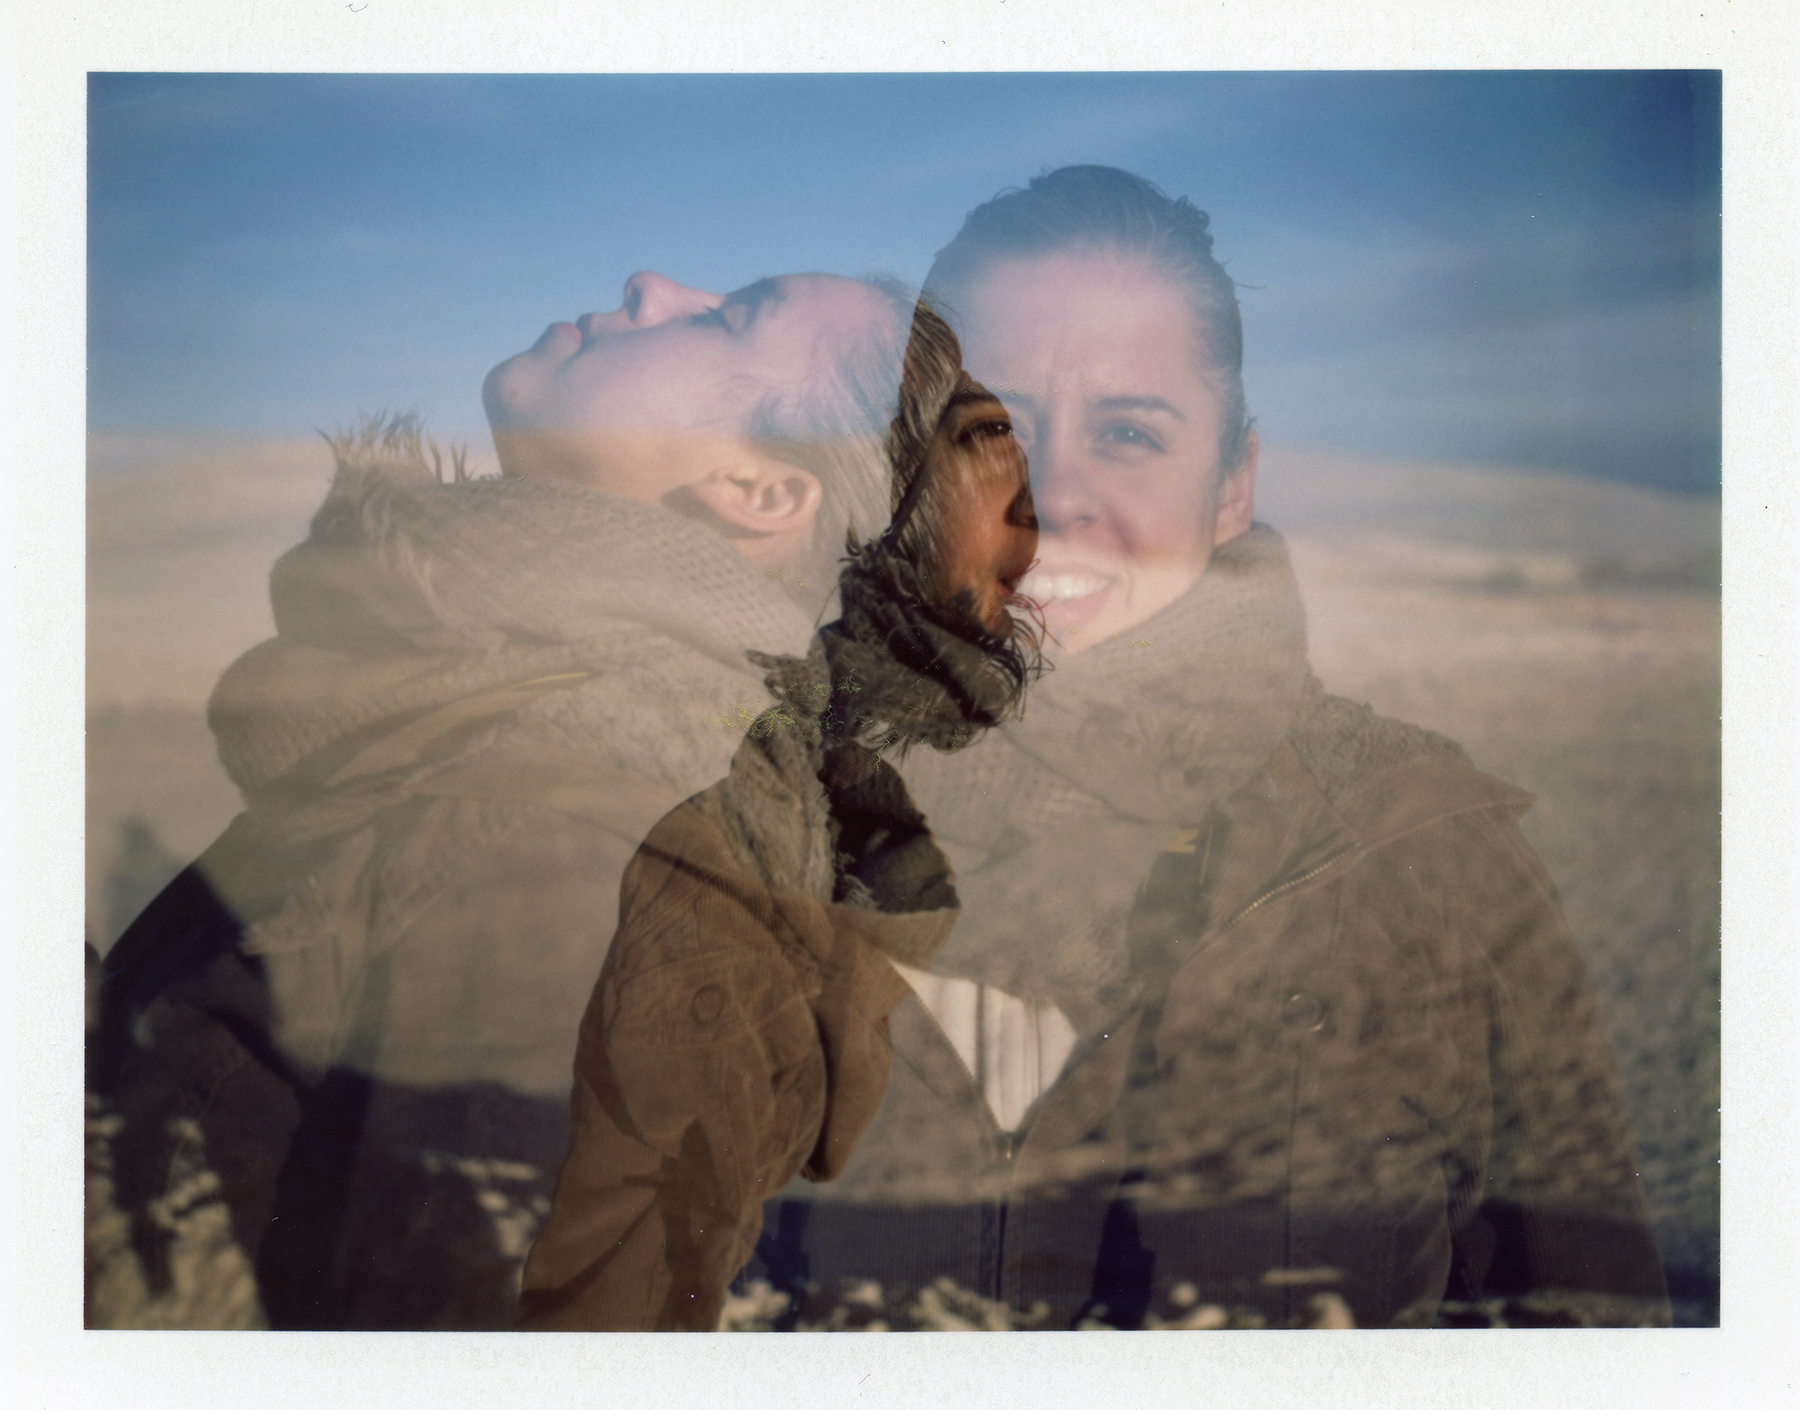 Untitled | Polaroid Automatic 100 Land  Camera | Fuji FP-100C | Barbara Justice